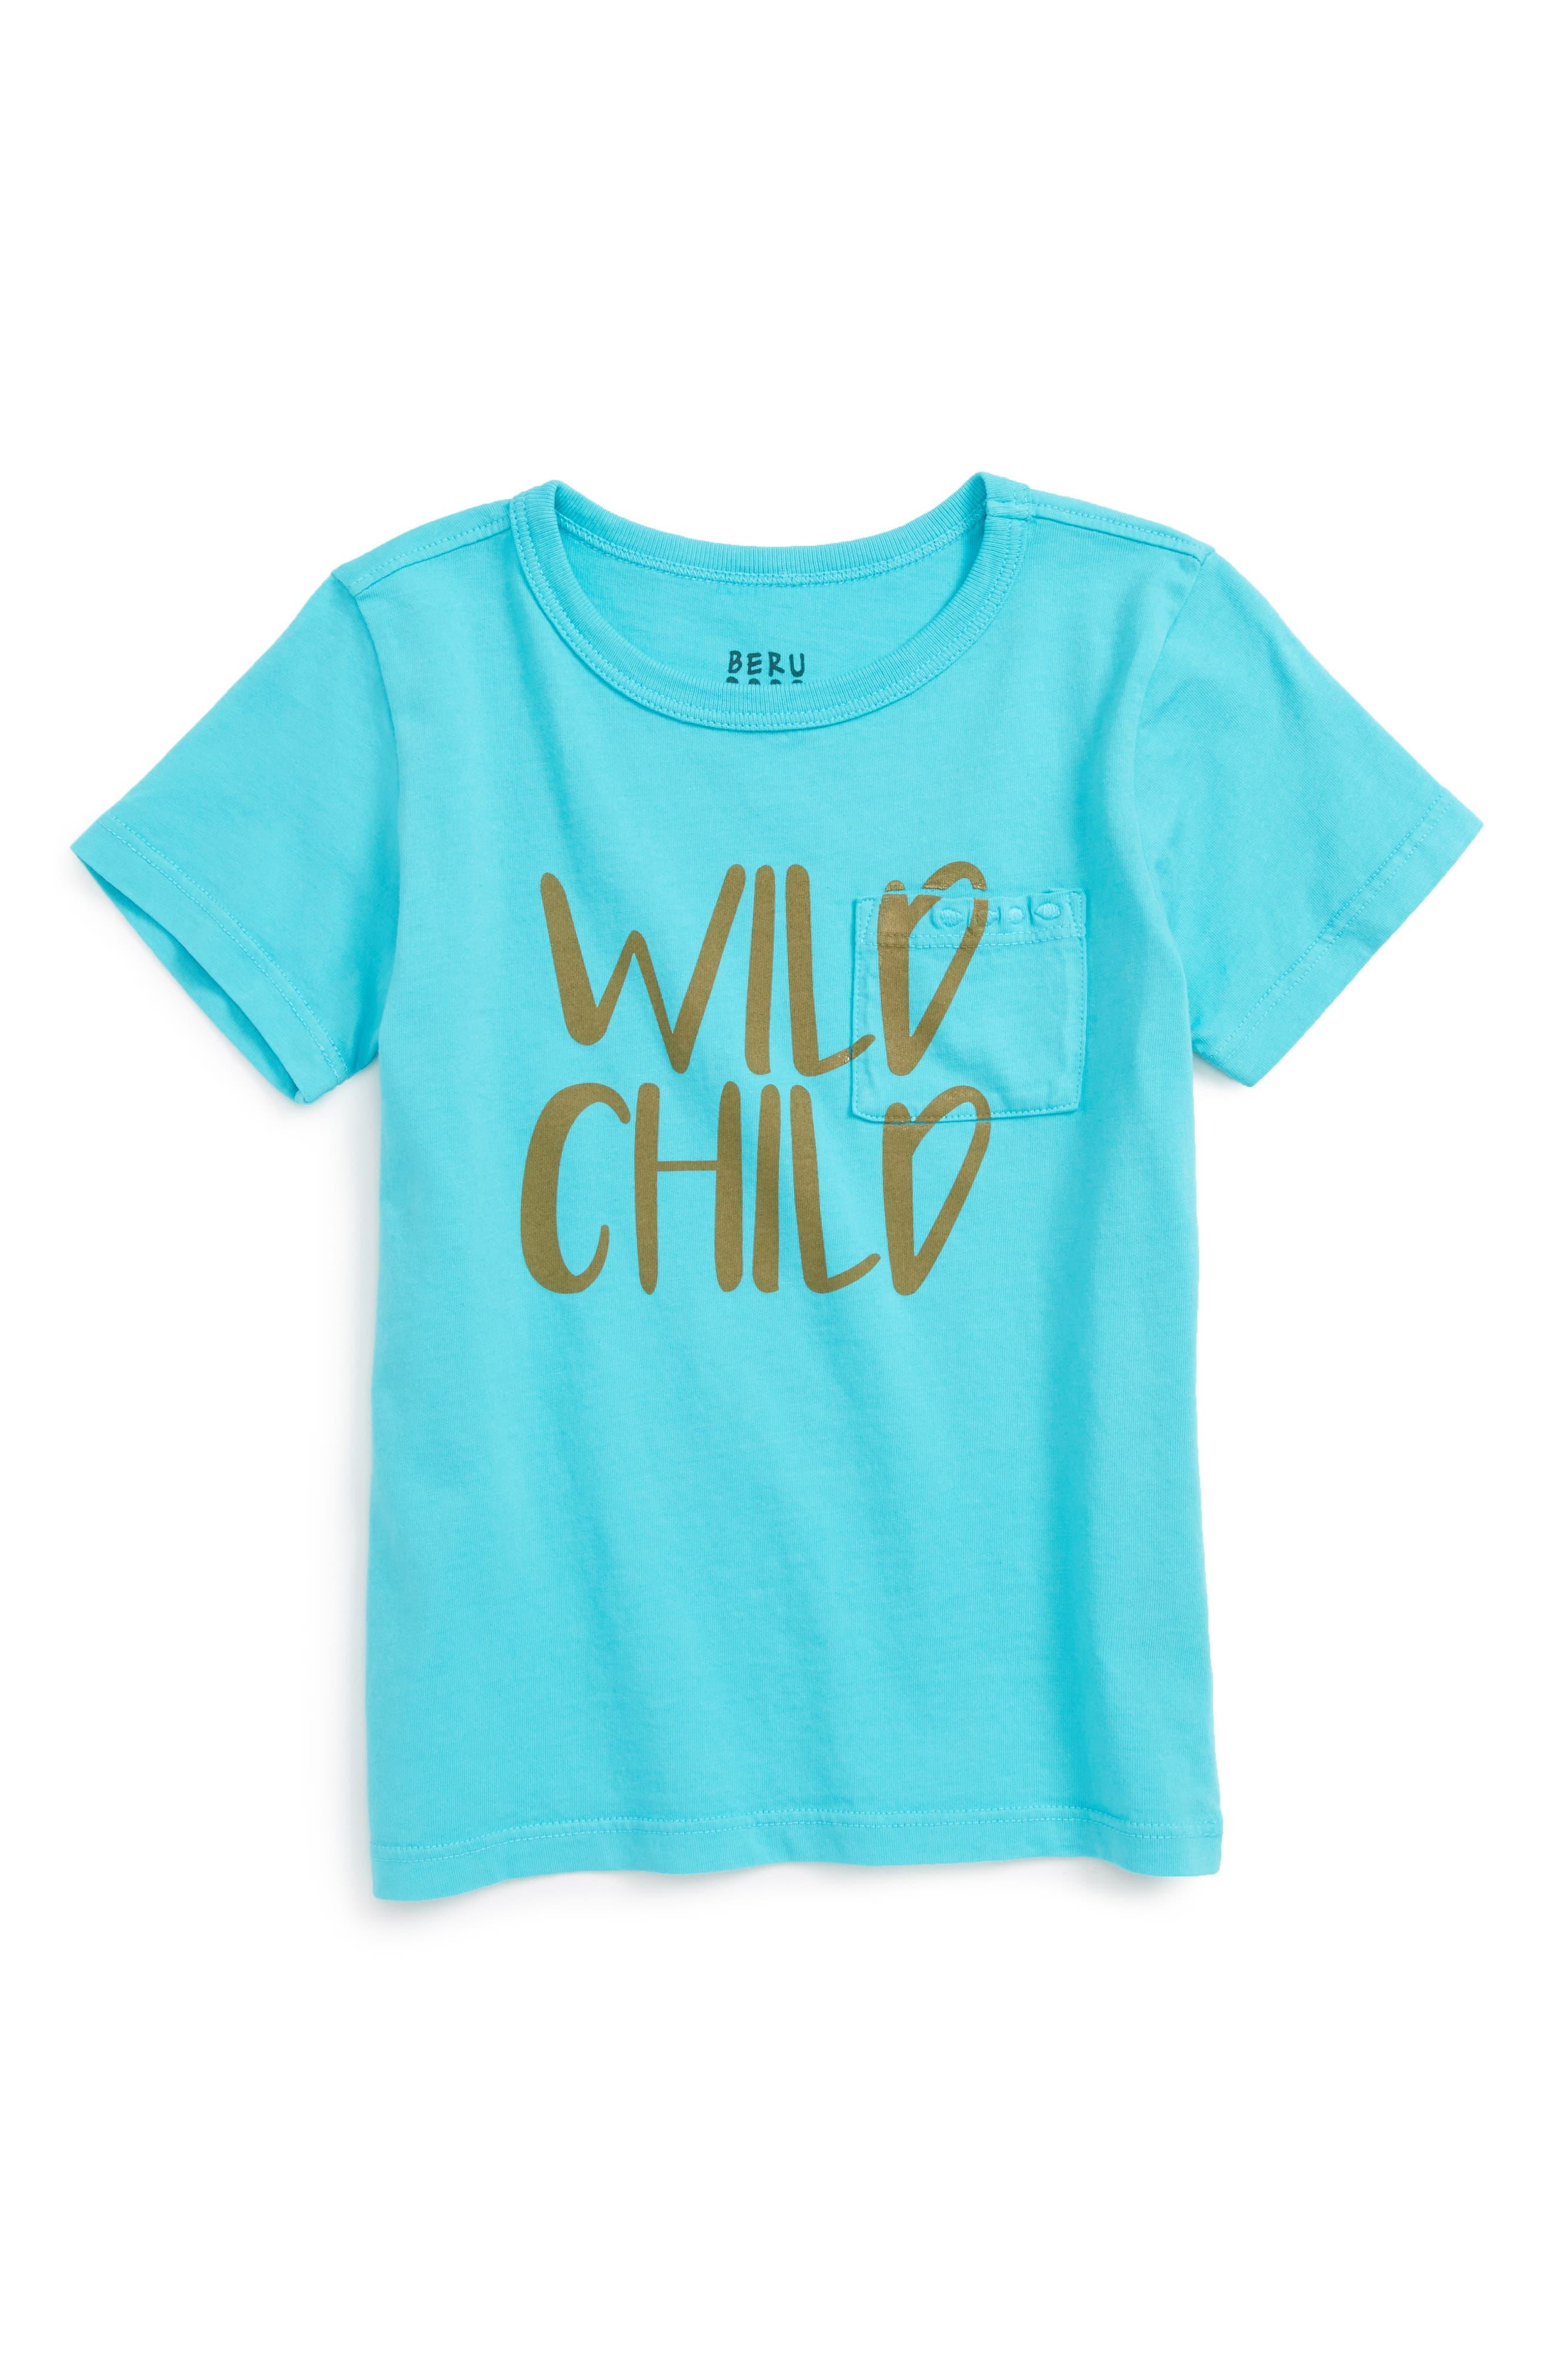 Main Image - BERU Wild Child Organic Cotton Tee (Toddler Boys & Little Boys)